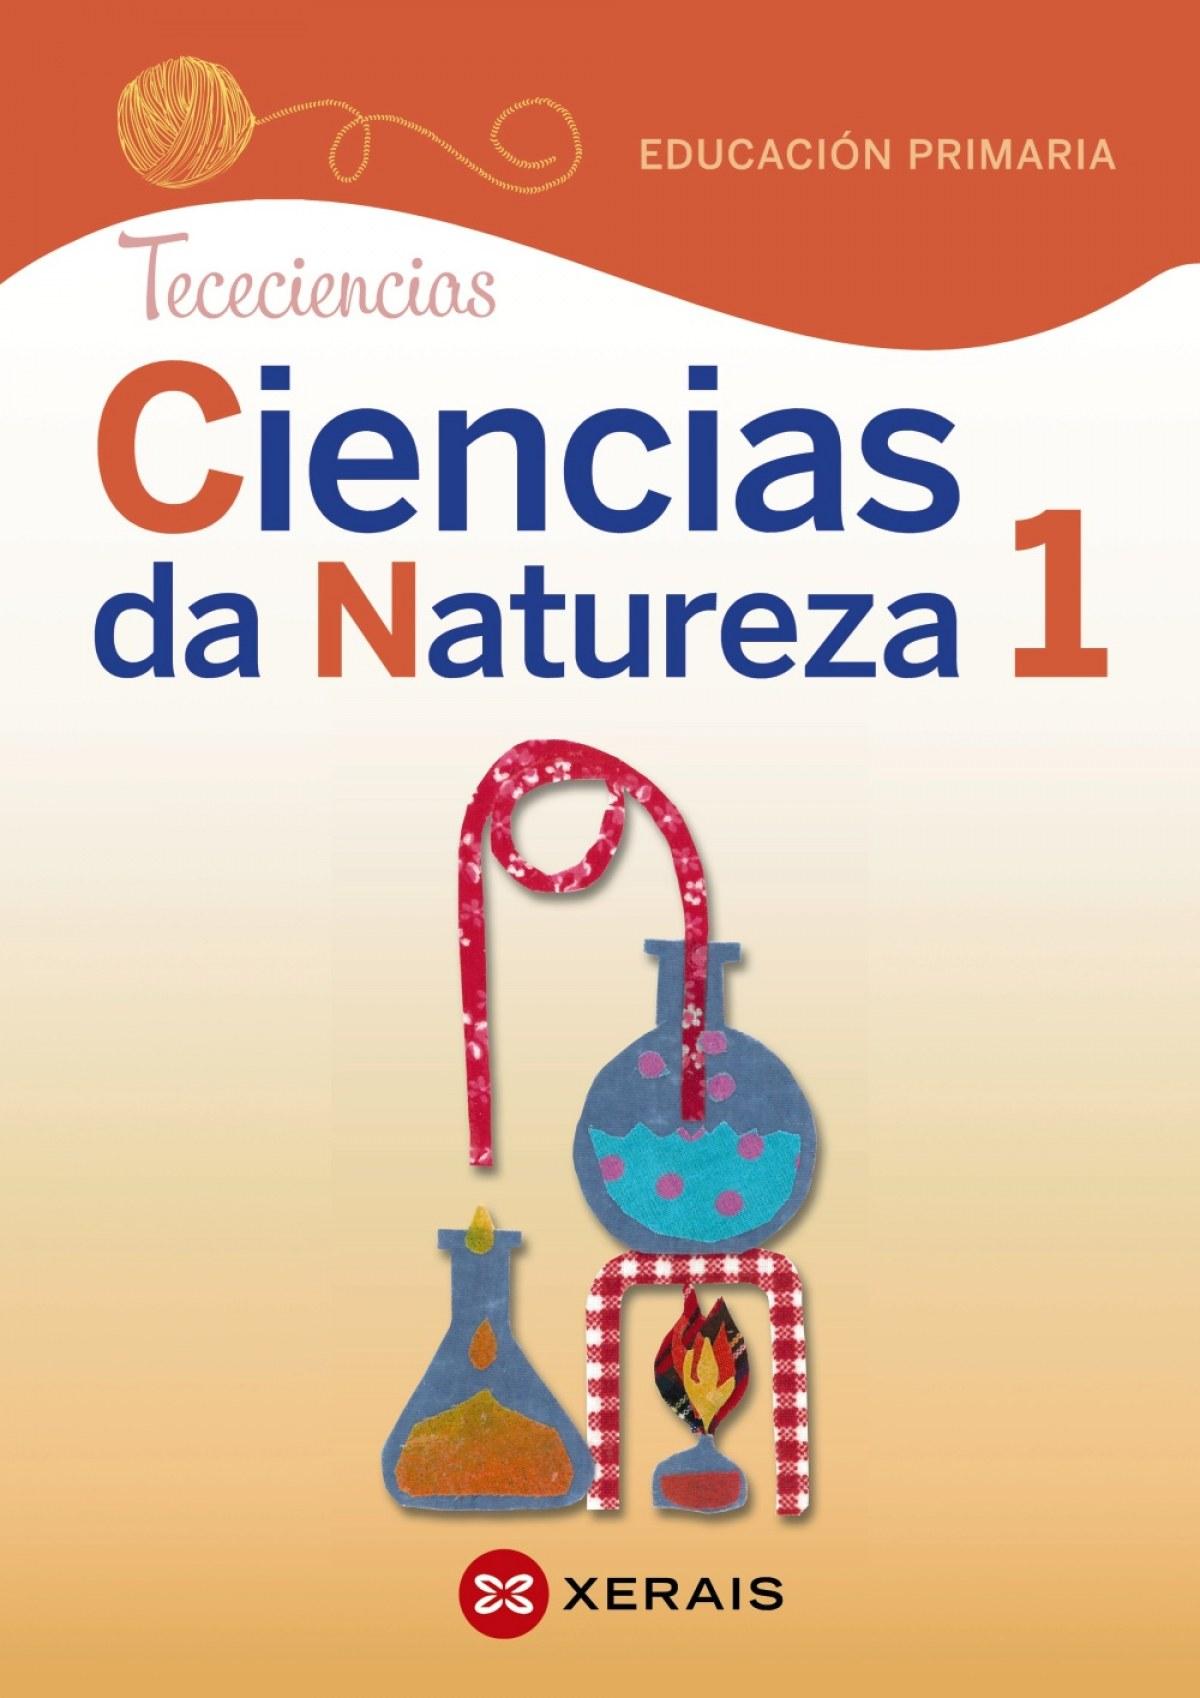 Ciencias da Natureza 1. Educación Primaria. Proxecto Tececiencias (2020)